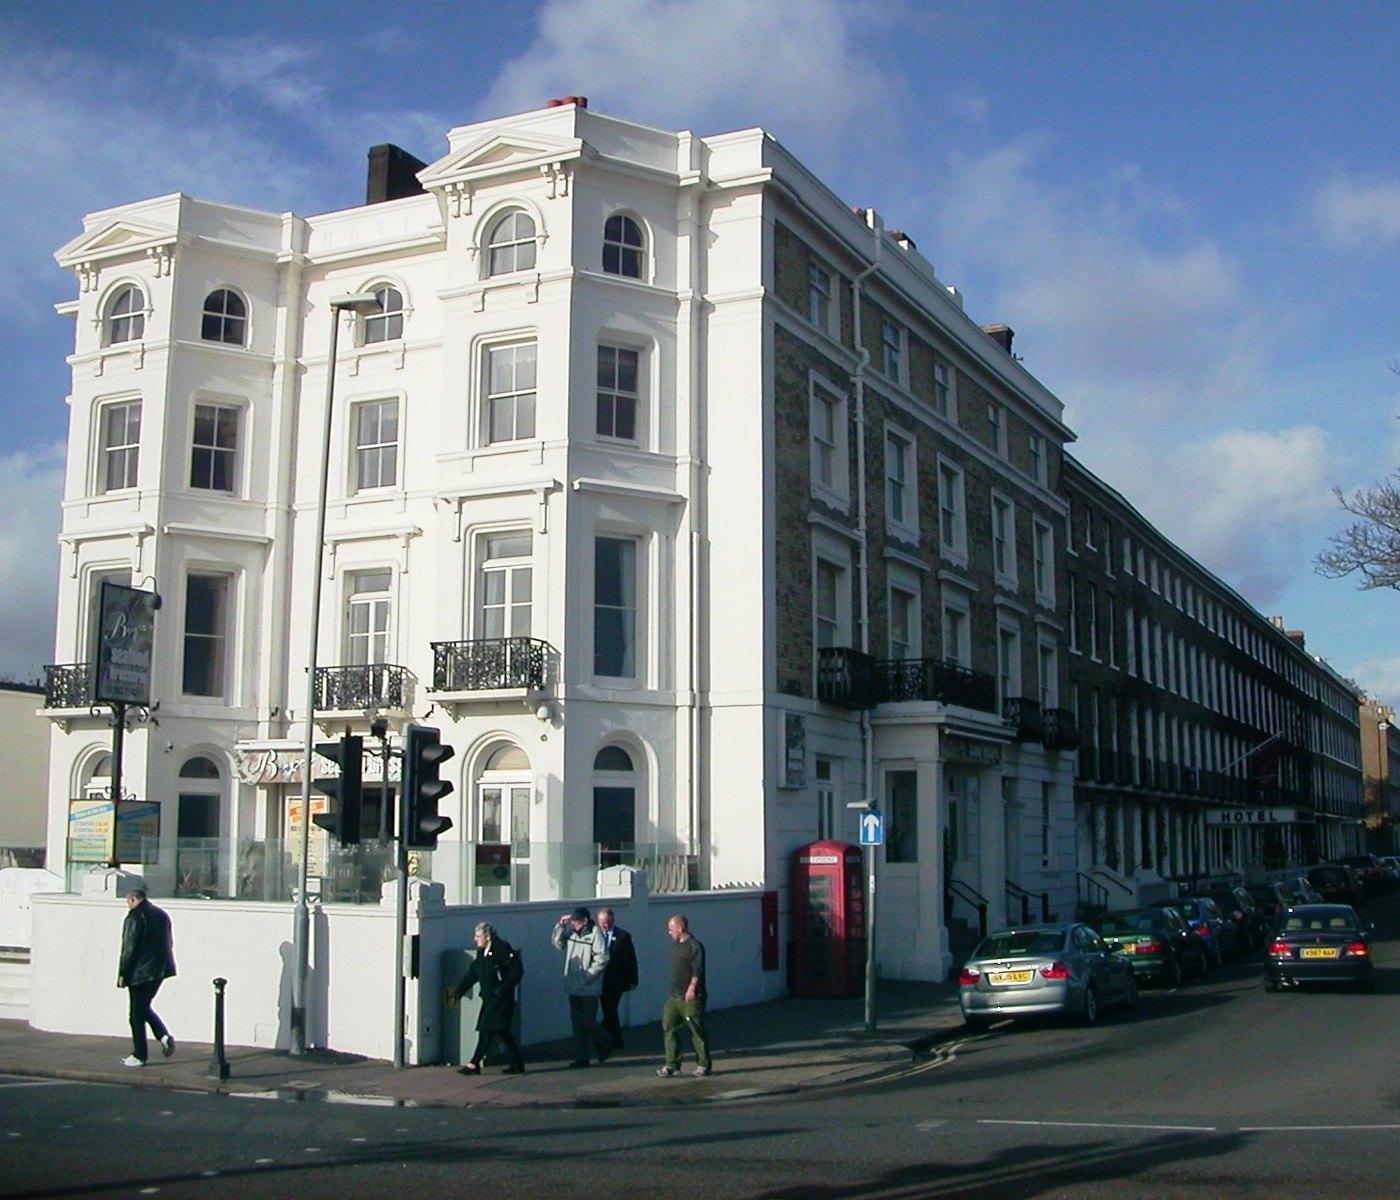 File Chatsworth Hotel The Steyne Worthing Ioe Code 433054 Jpg